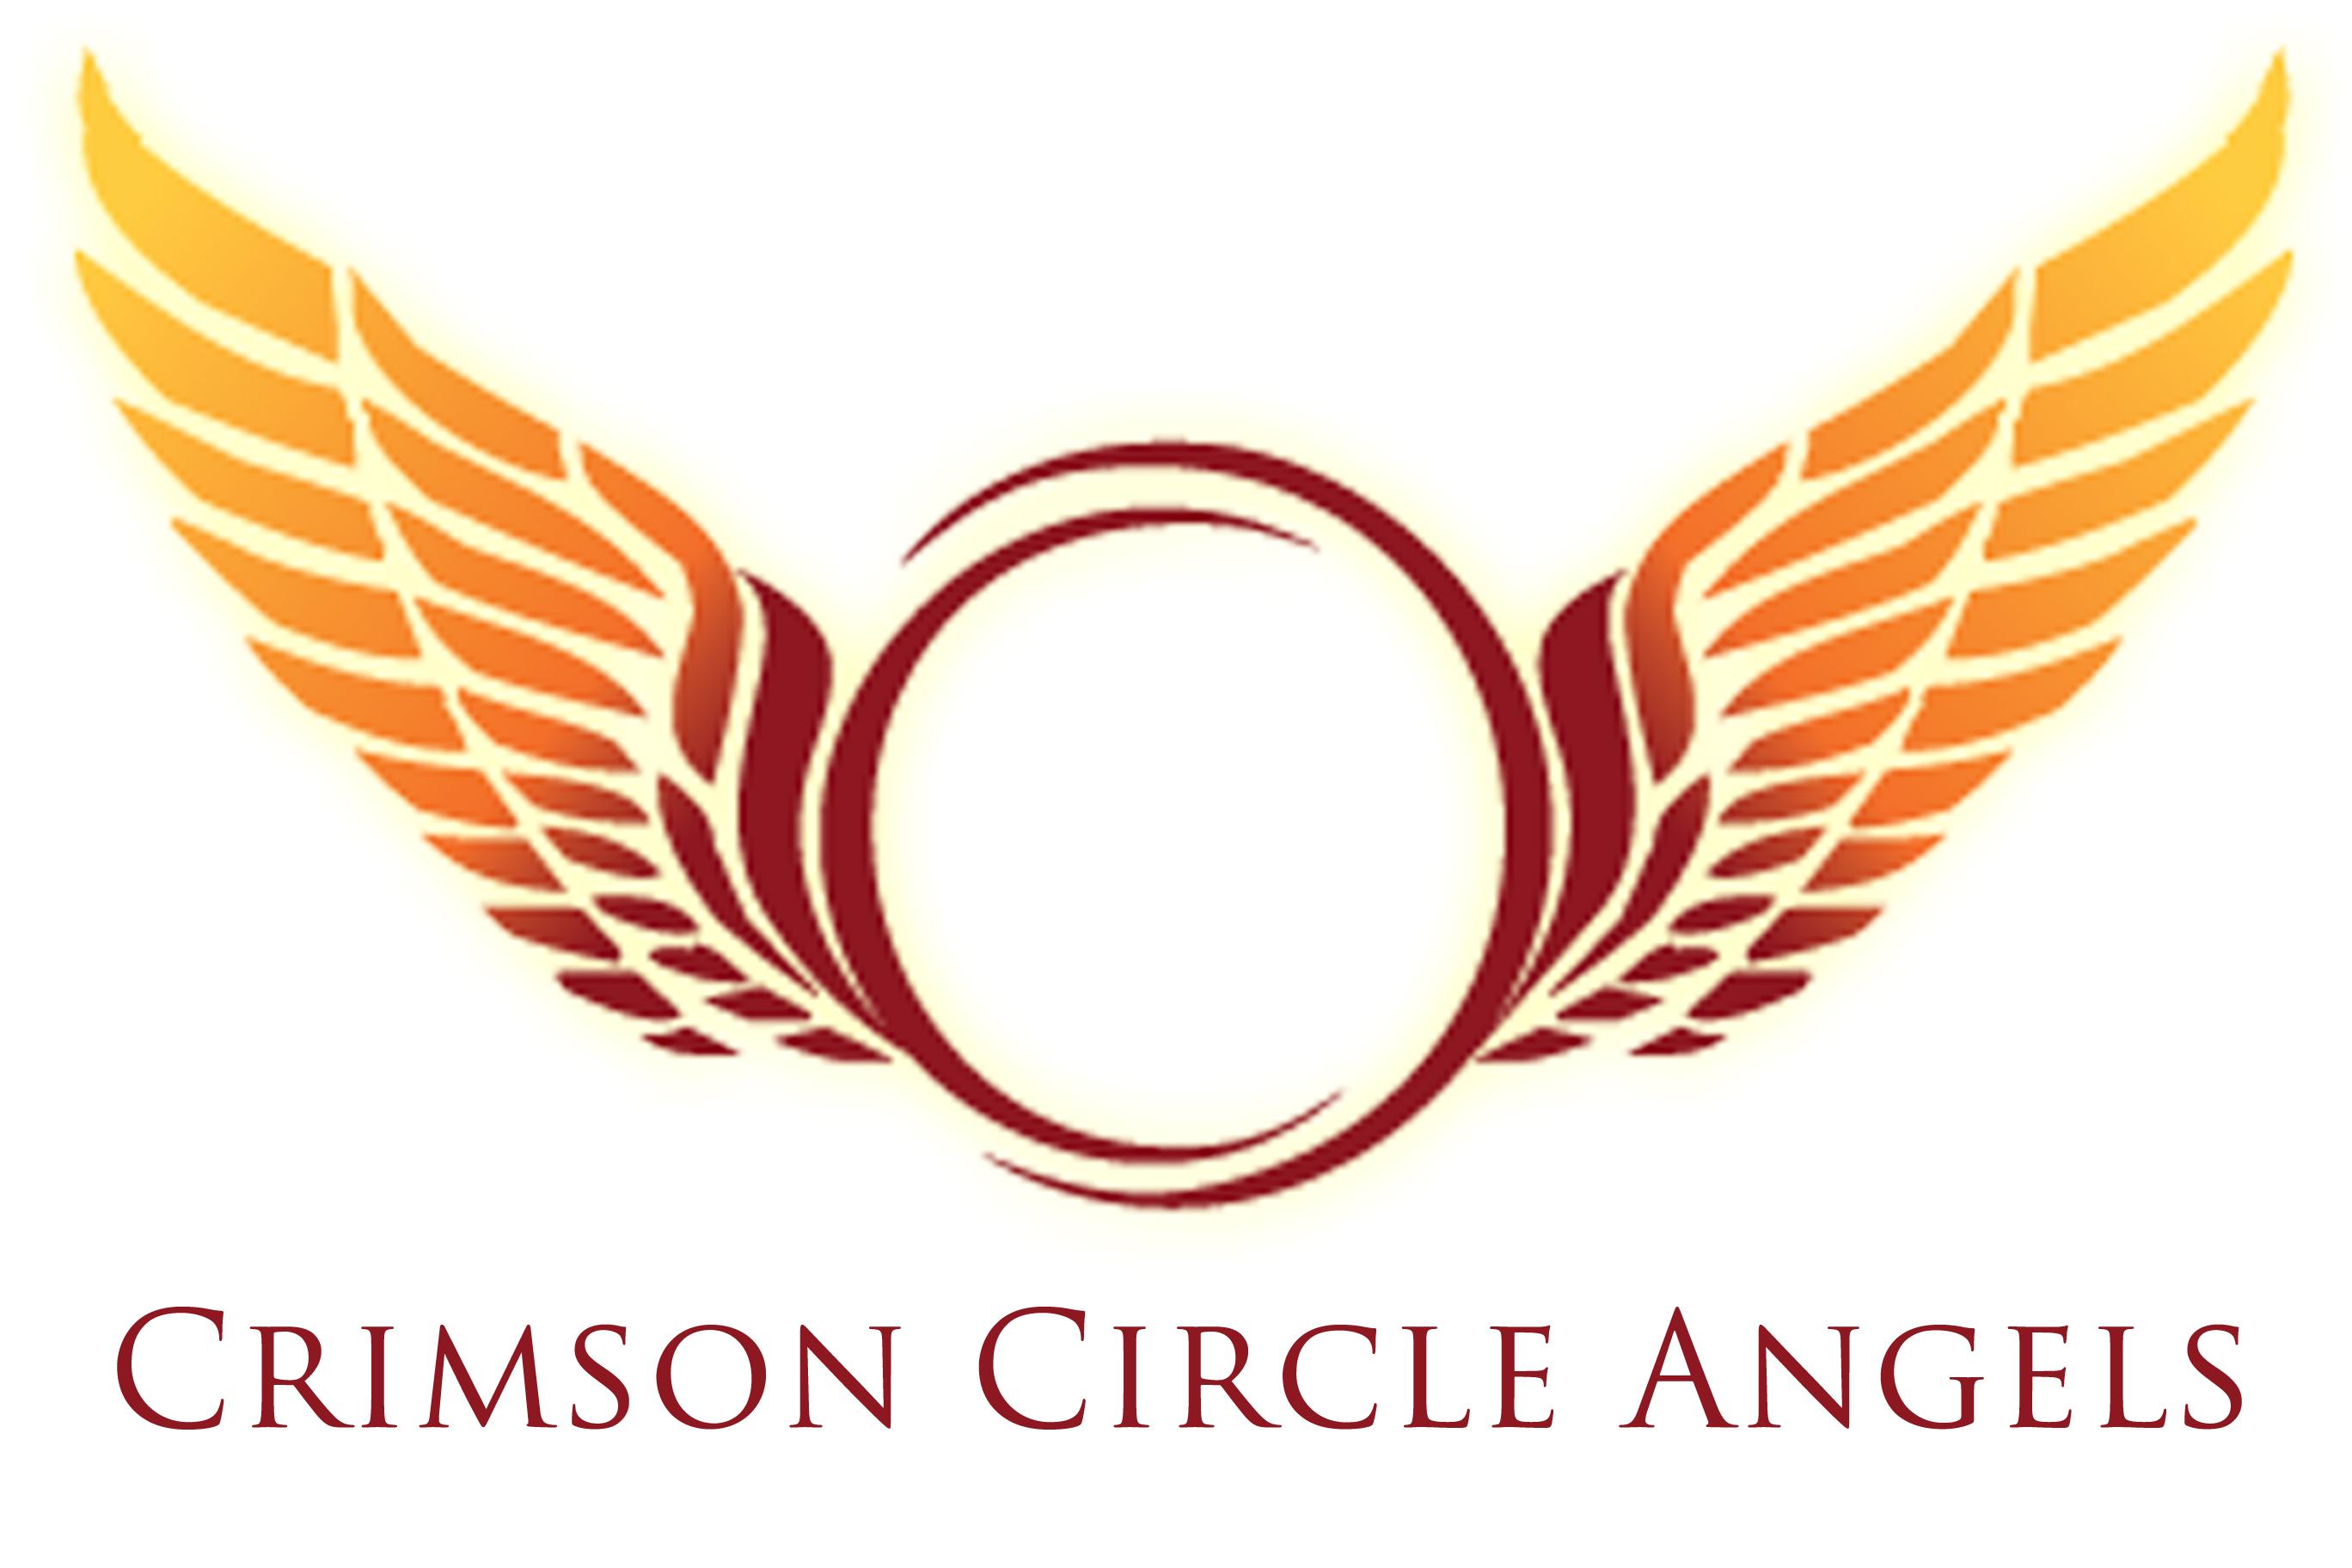 angel wings logos rh logolynx com wing logo design wing logo on car